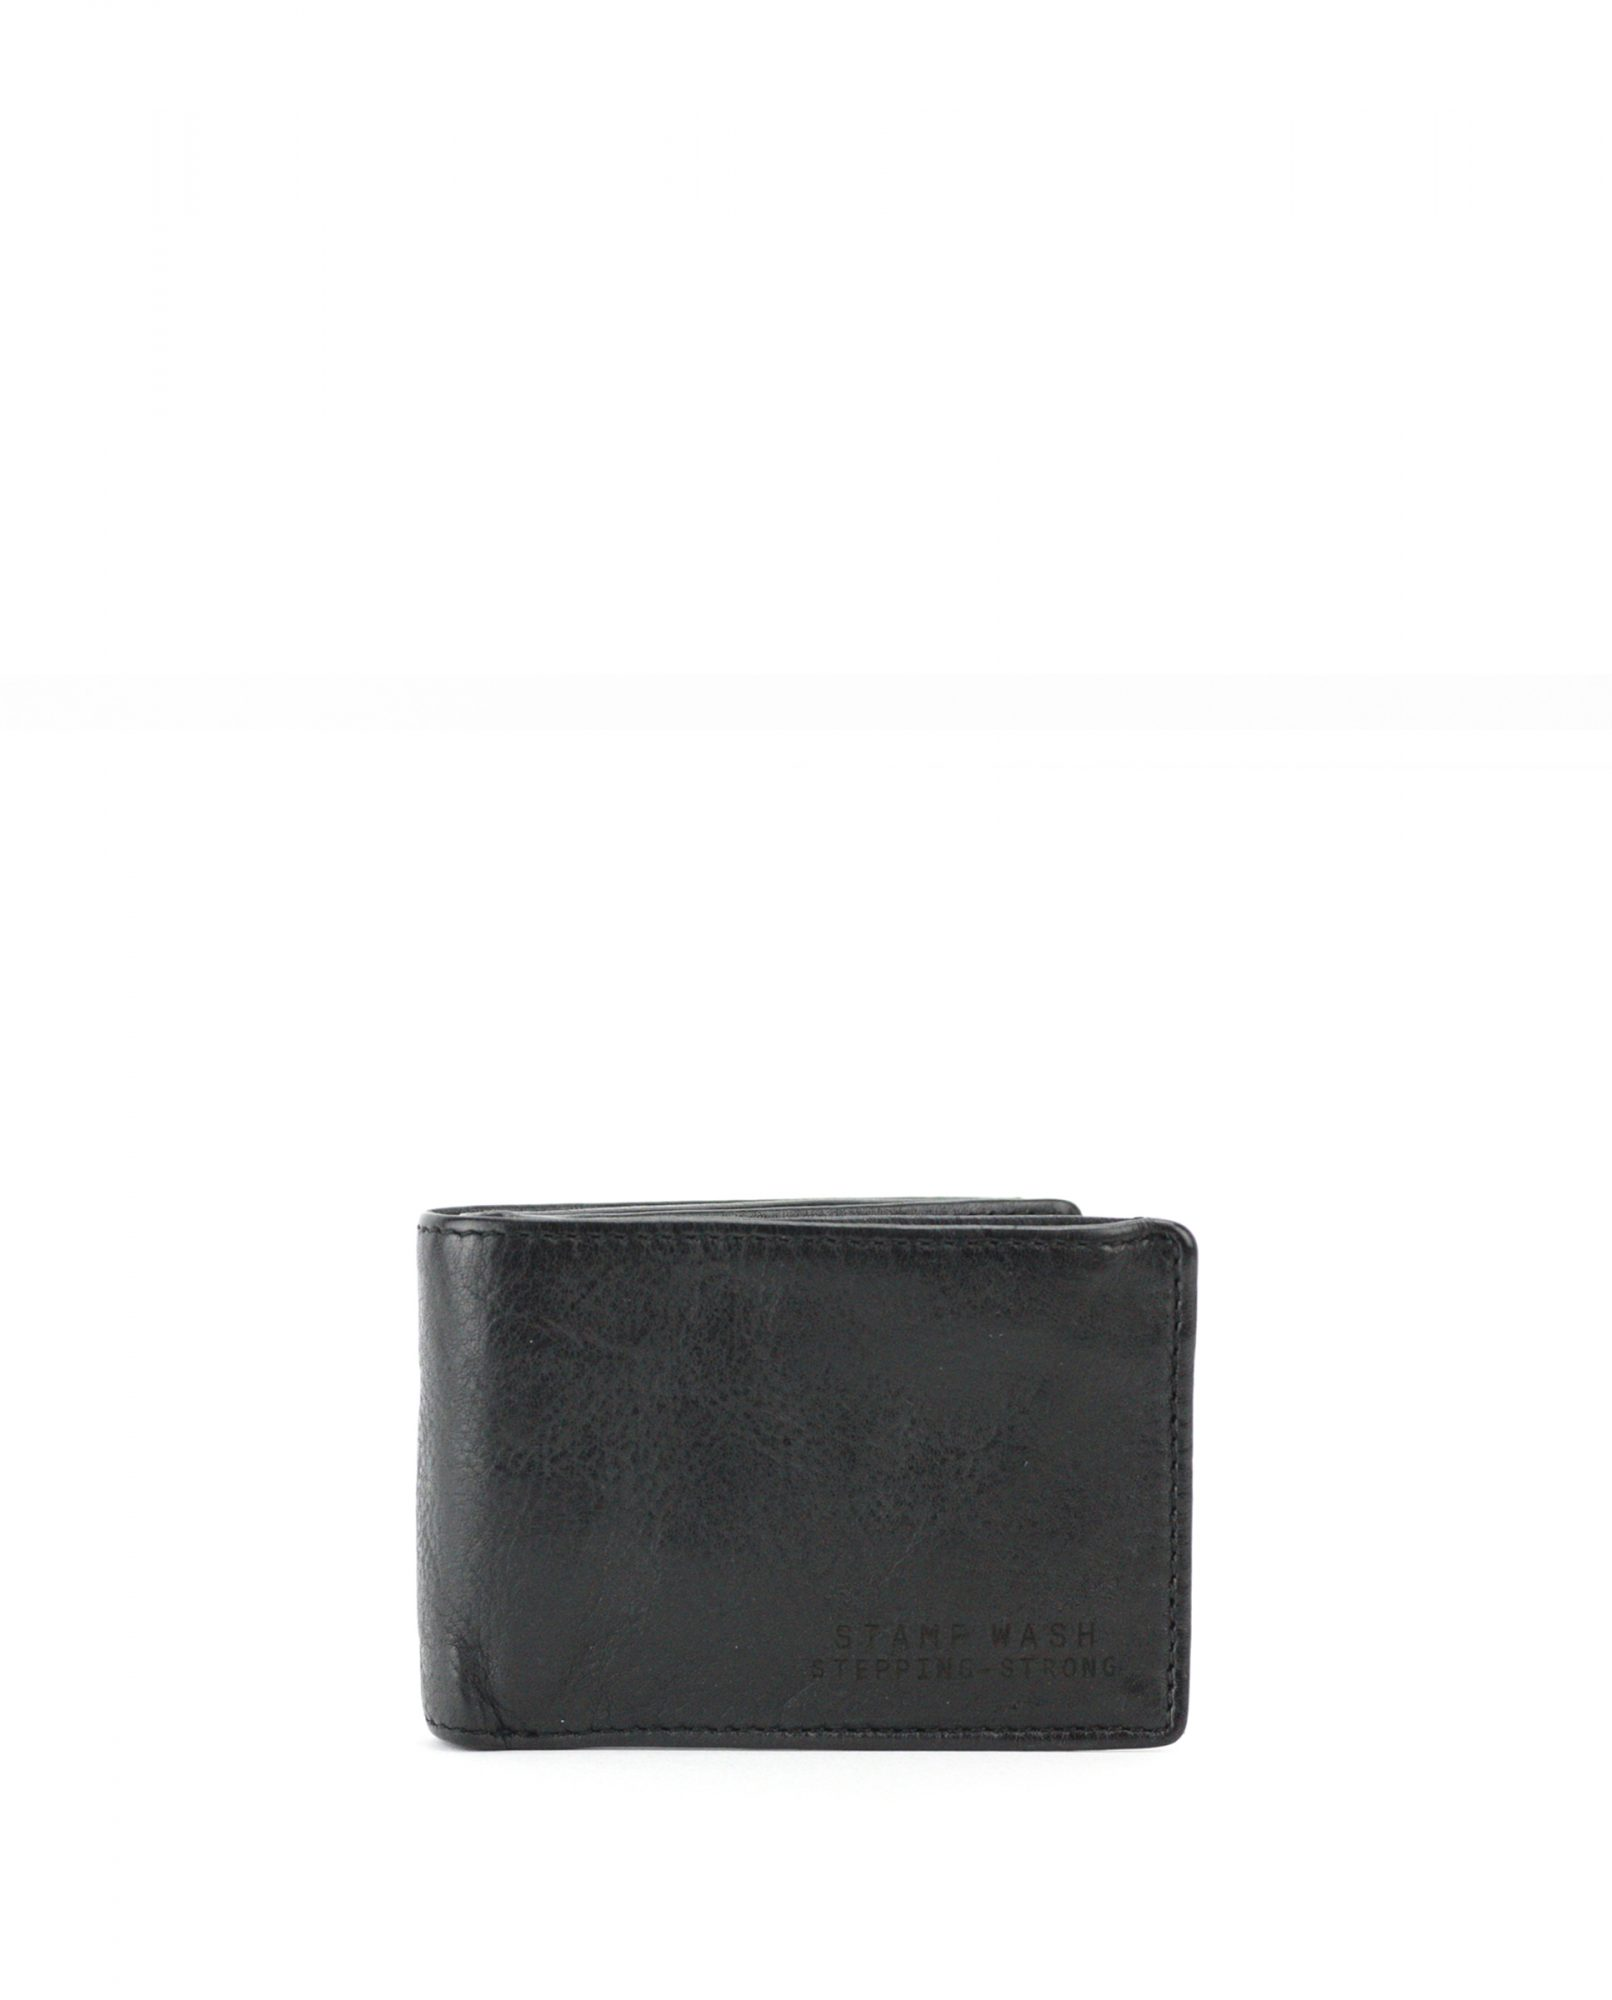 TICHI-Billetero de piel Stamp color negro-MHST11985NE-STAMP